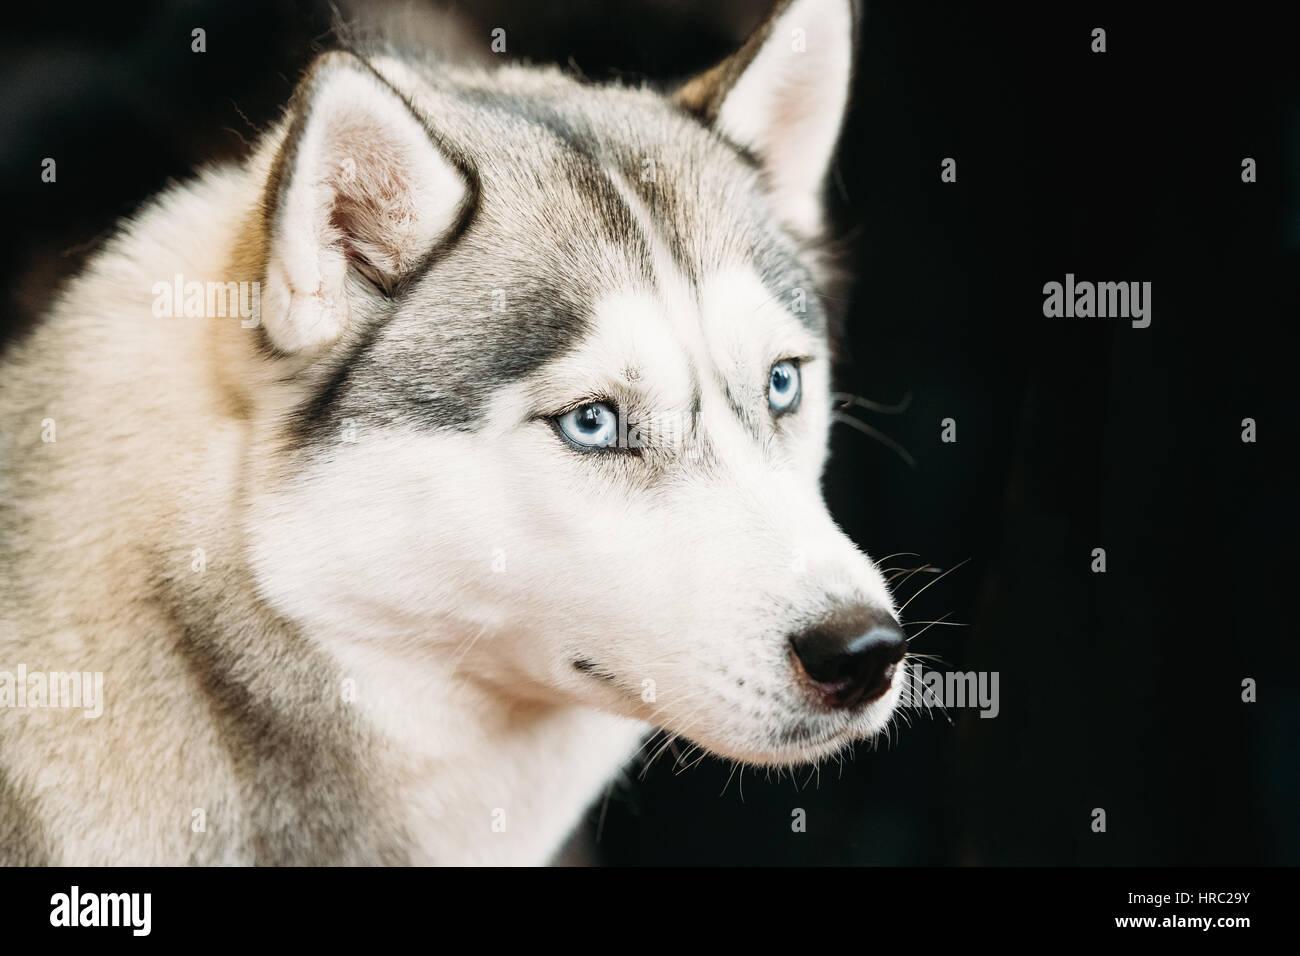 White And Gray Adult Siberian Husky Dog Or Sibirsky Husky With Blue